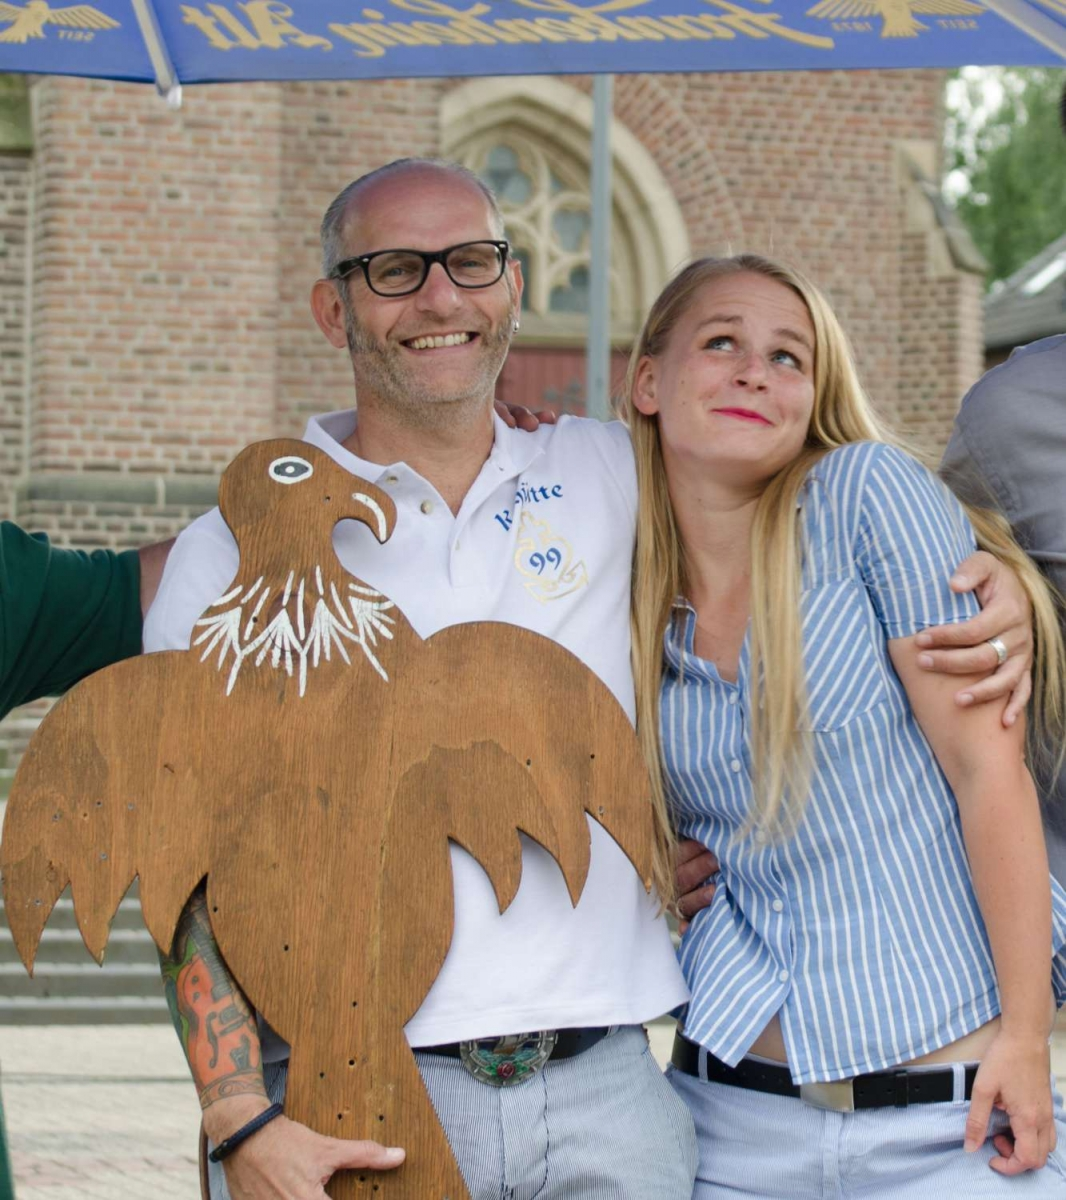 Schützenkönig Norbert Blum mit Lebensgefährtin Jessica Rankers 1333x1500